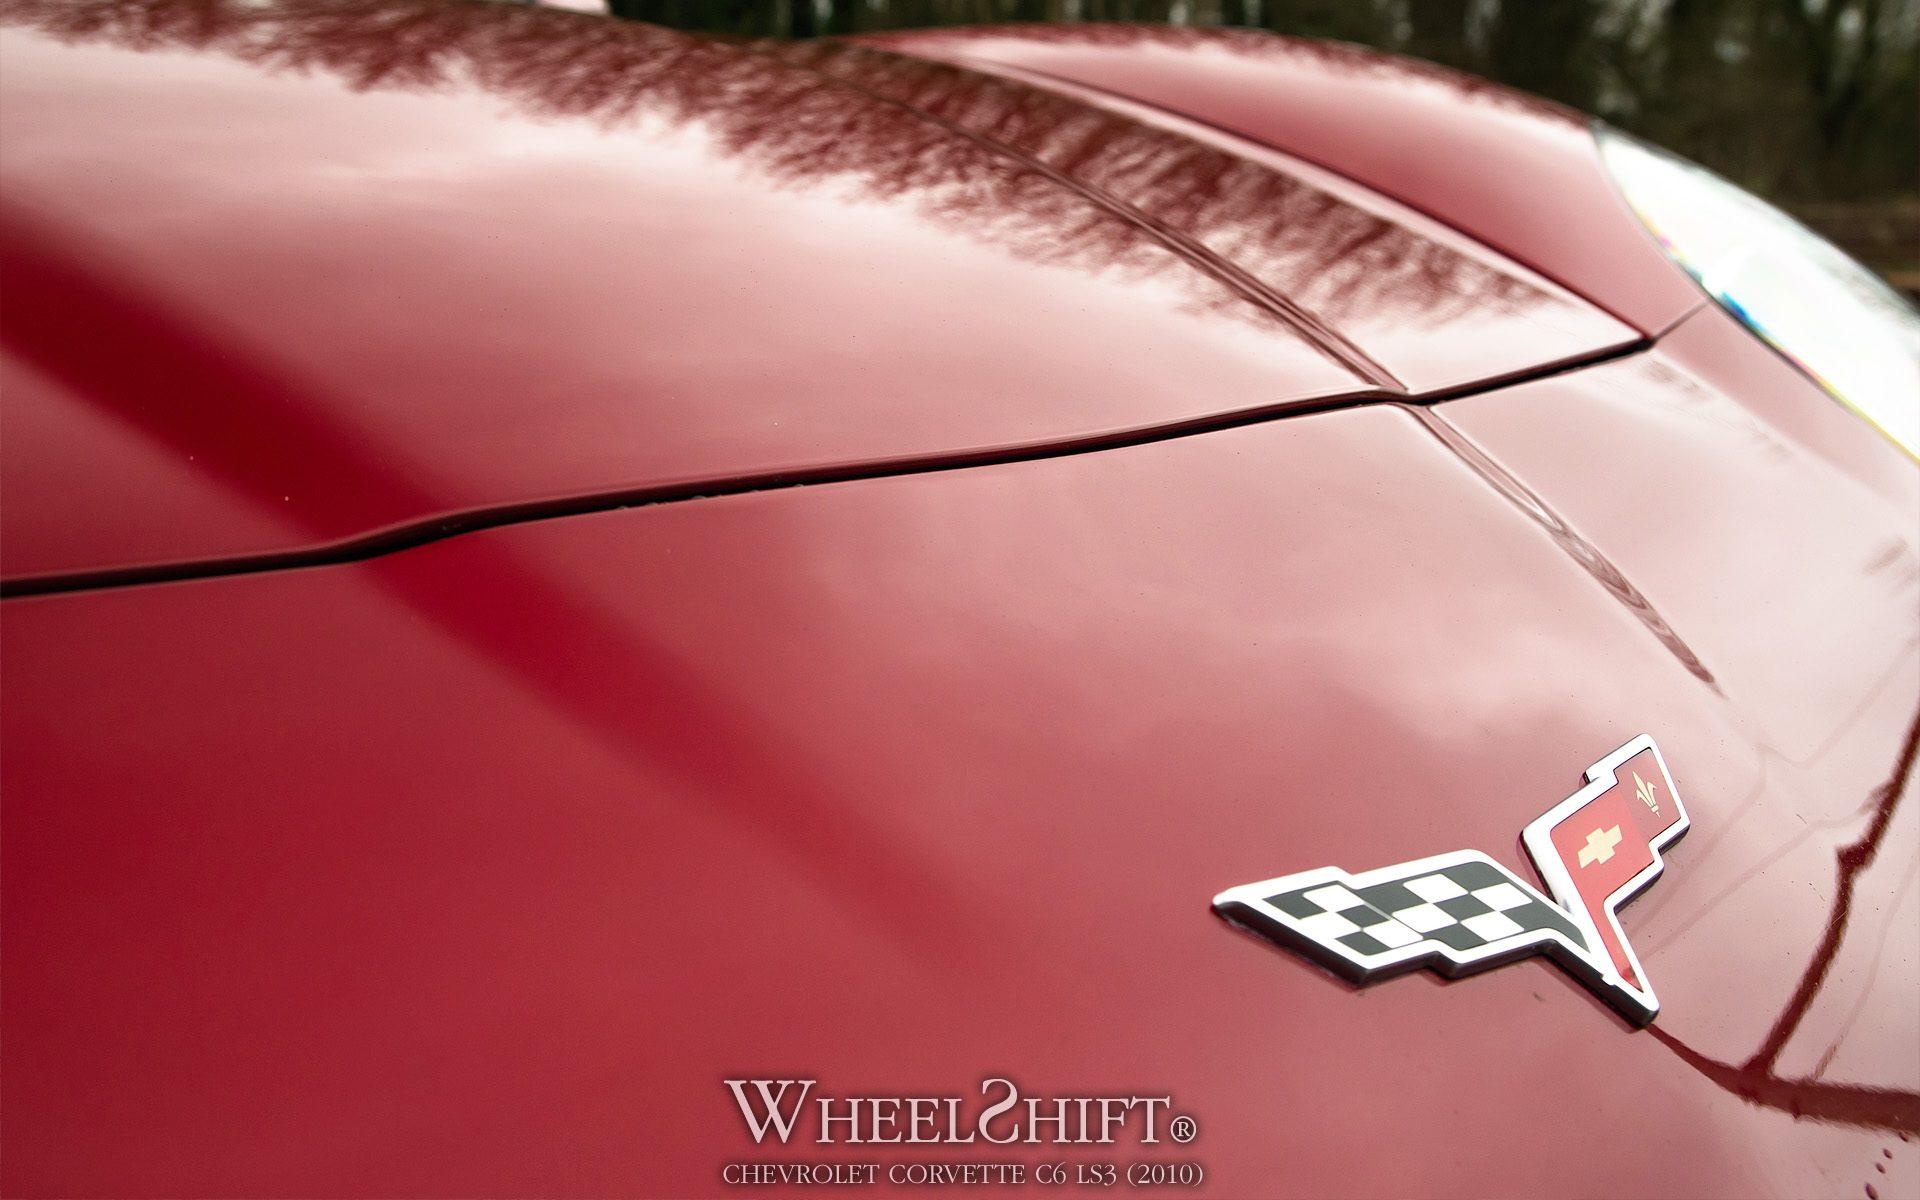 Chevrolet Corvette C6 LS3 (2010)